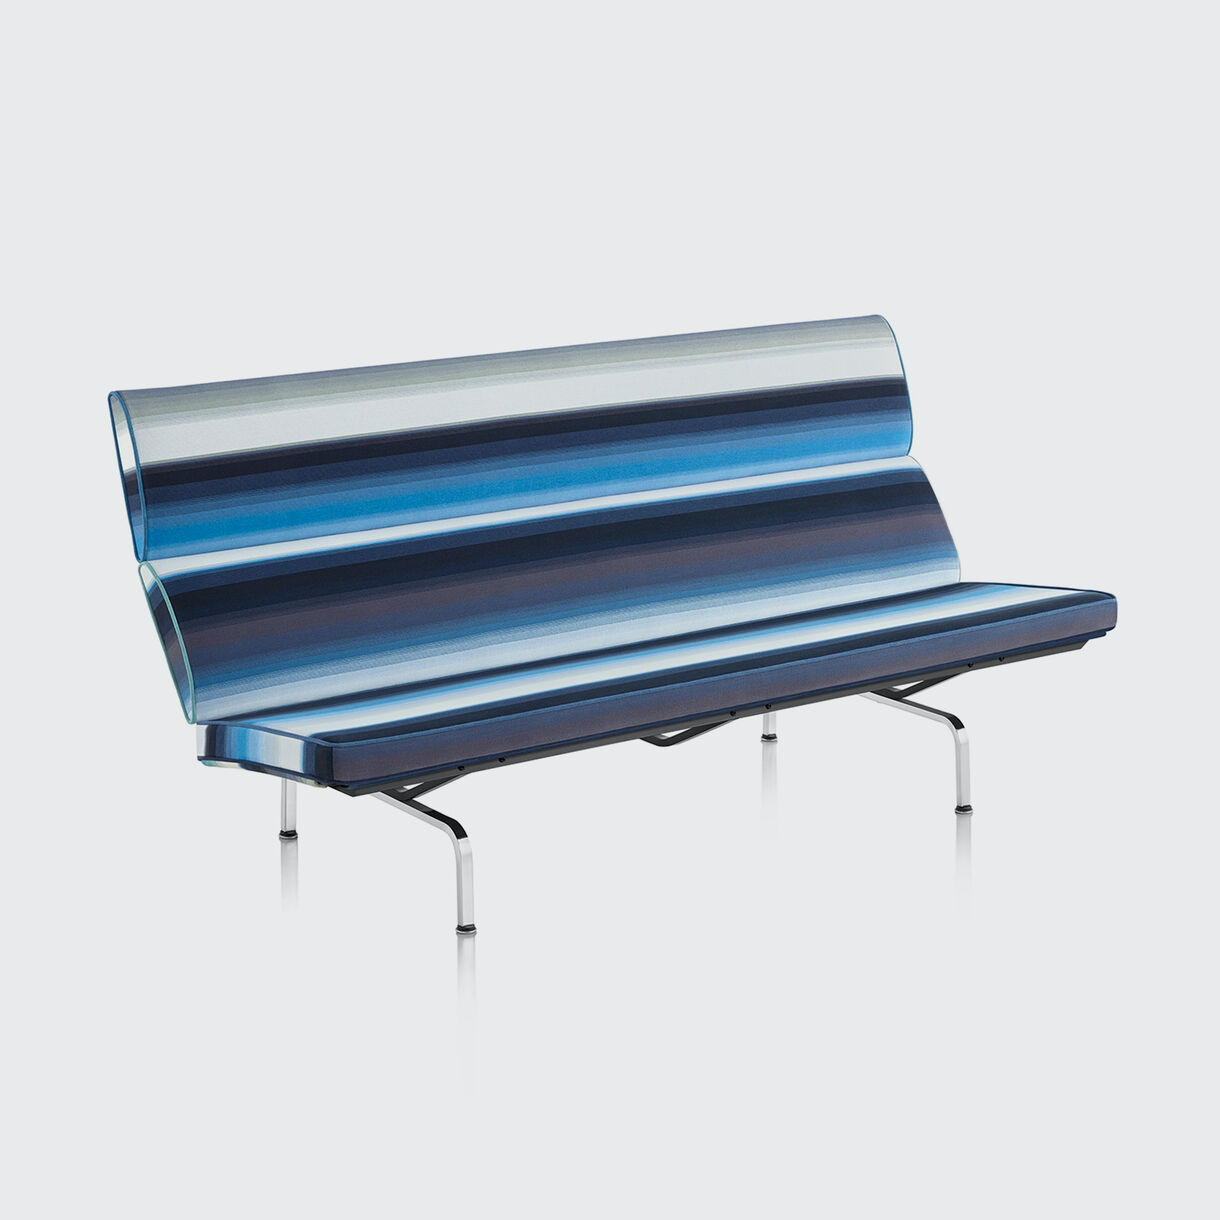 Eames Sofa Compact, Paul Smith x Maharam